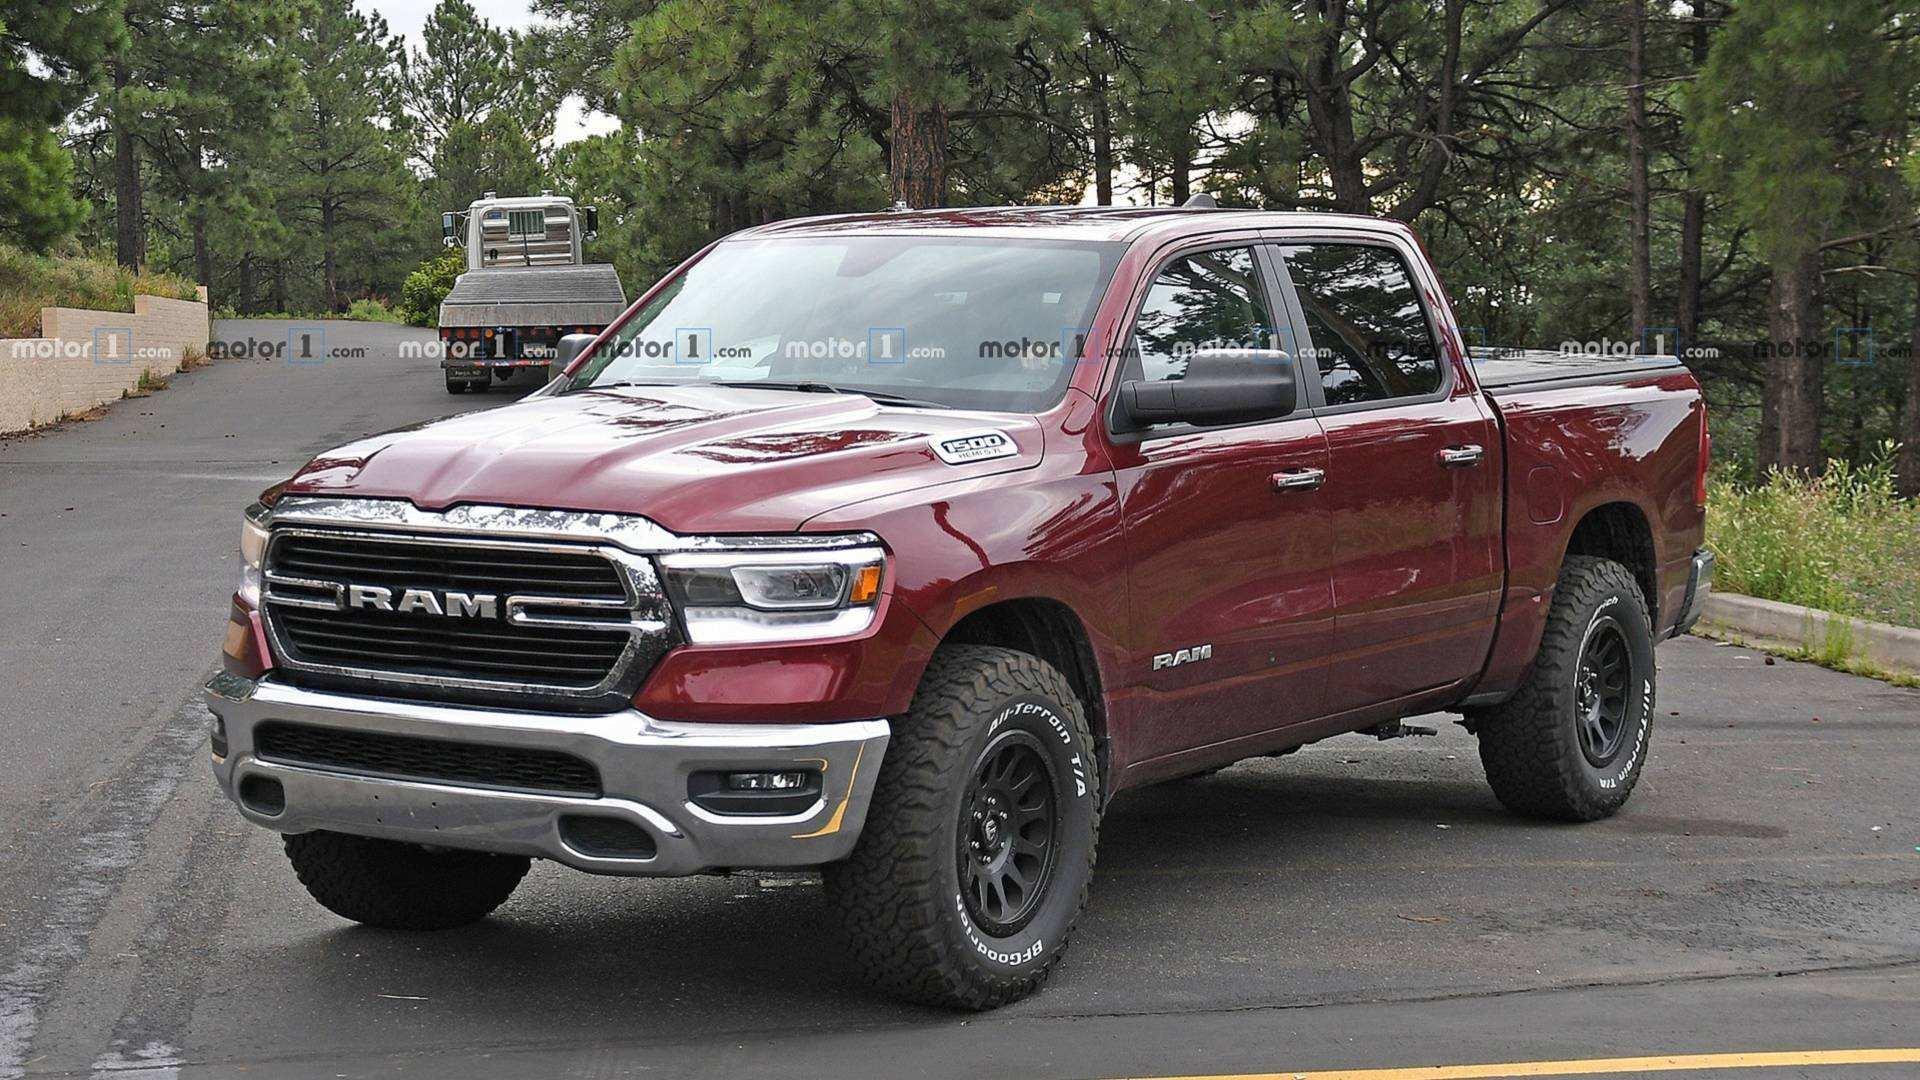 57 New 2020 Dodge Ram Rebel Trx Price for 2020 Dodge Ram Rebel Trx